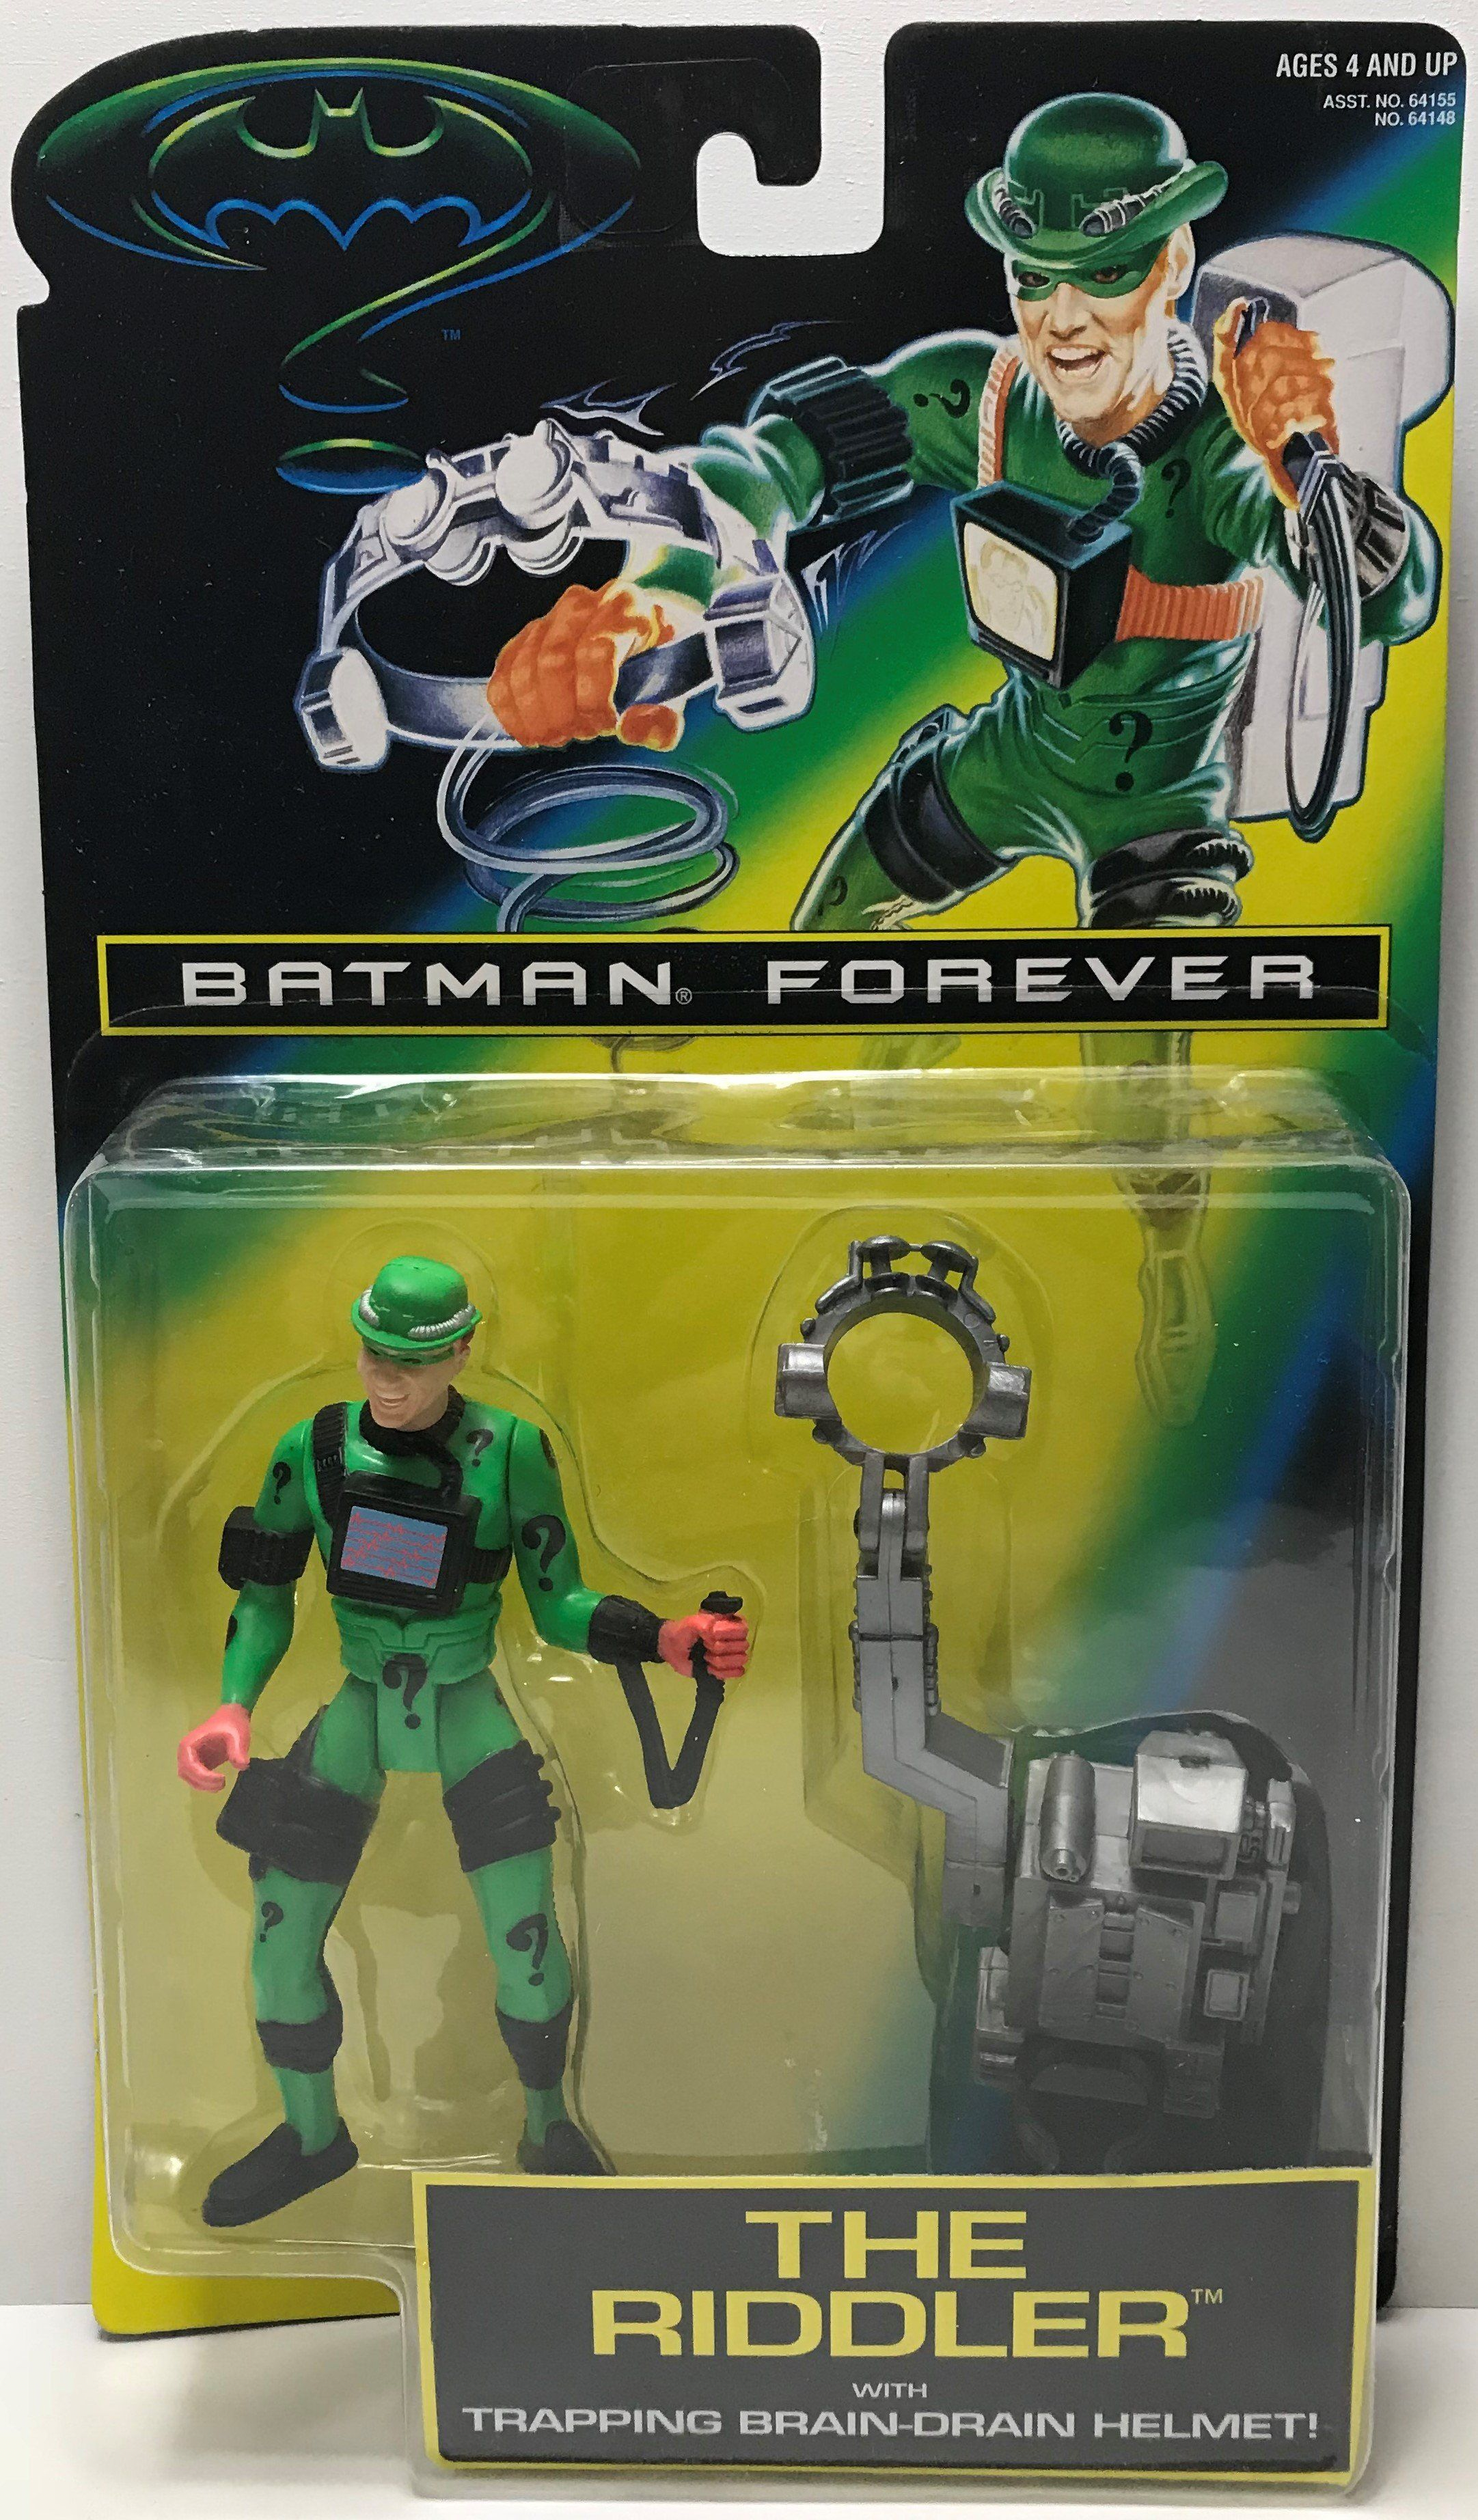 Brand New! Kenner Batman Forever The Riddler with Helmet action figure